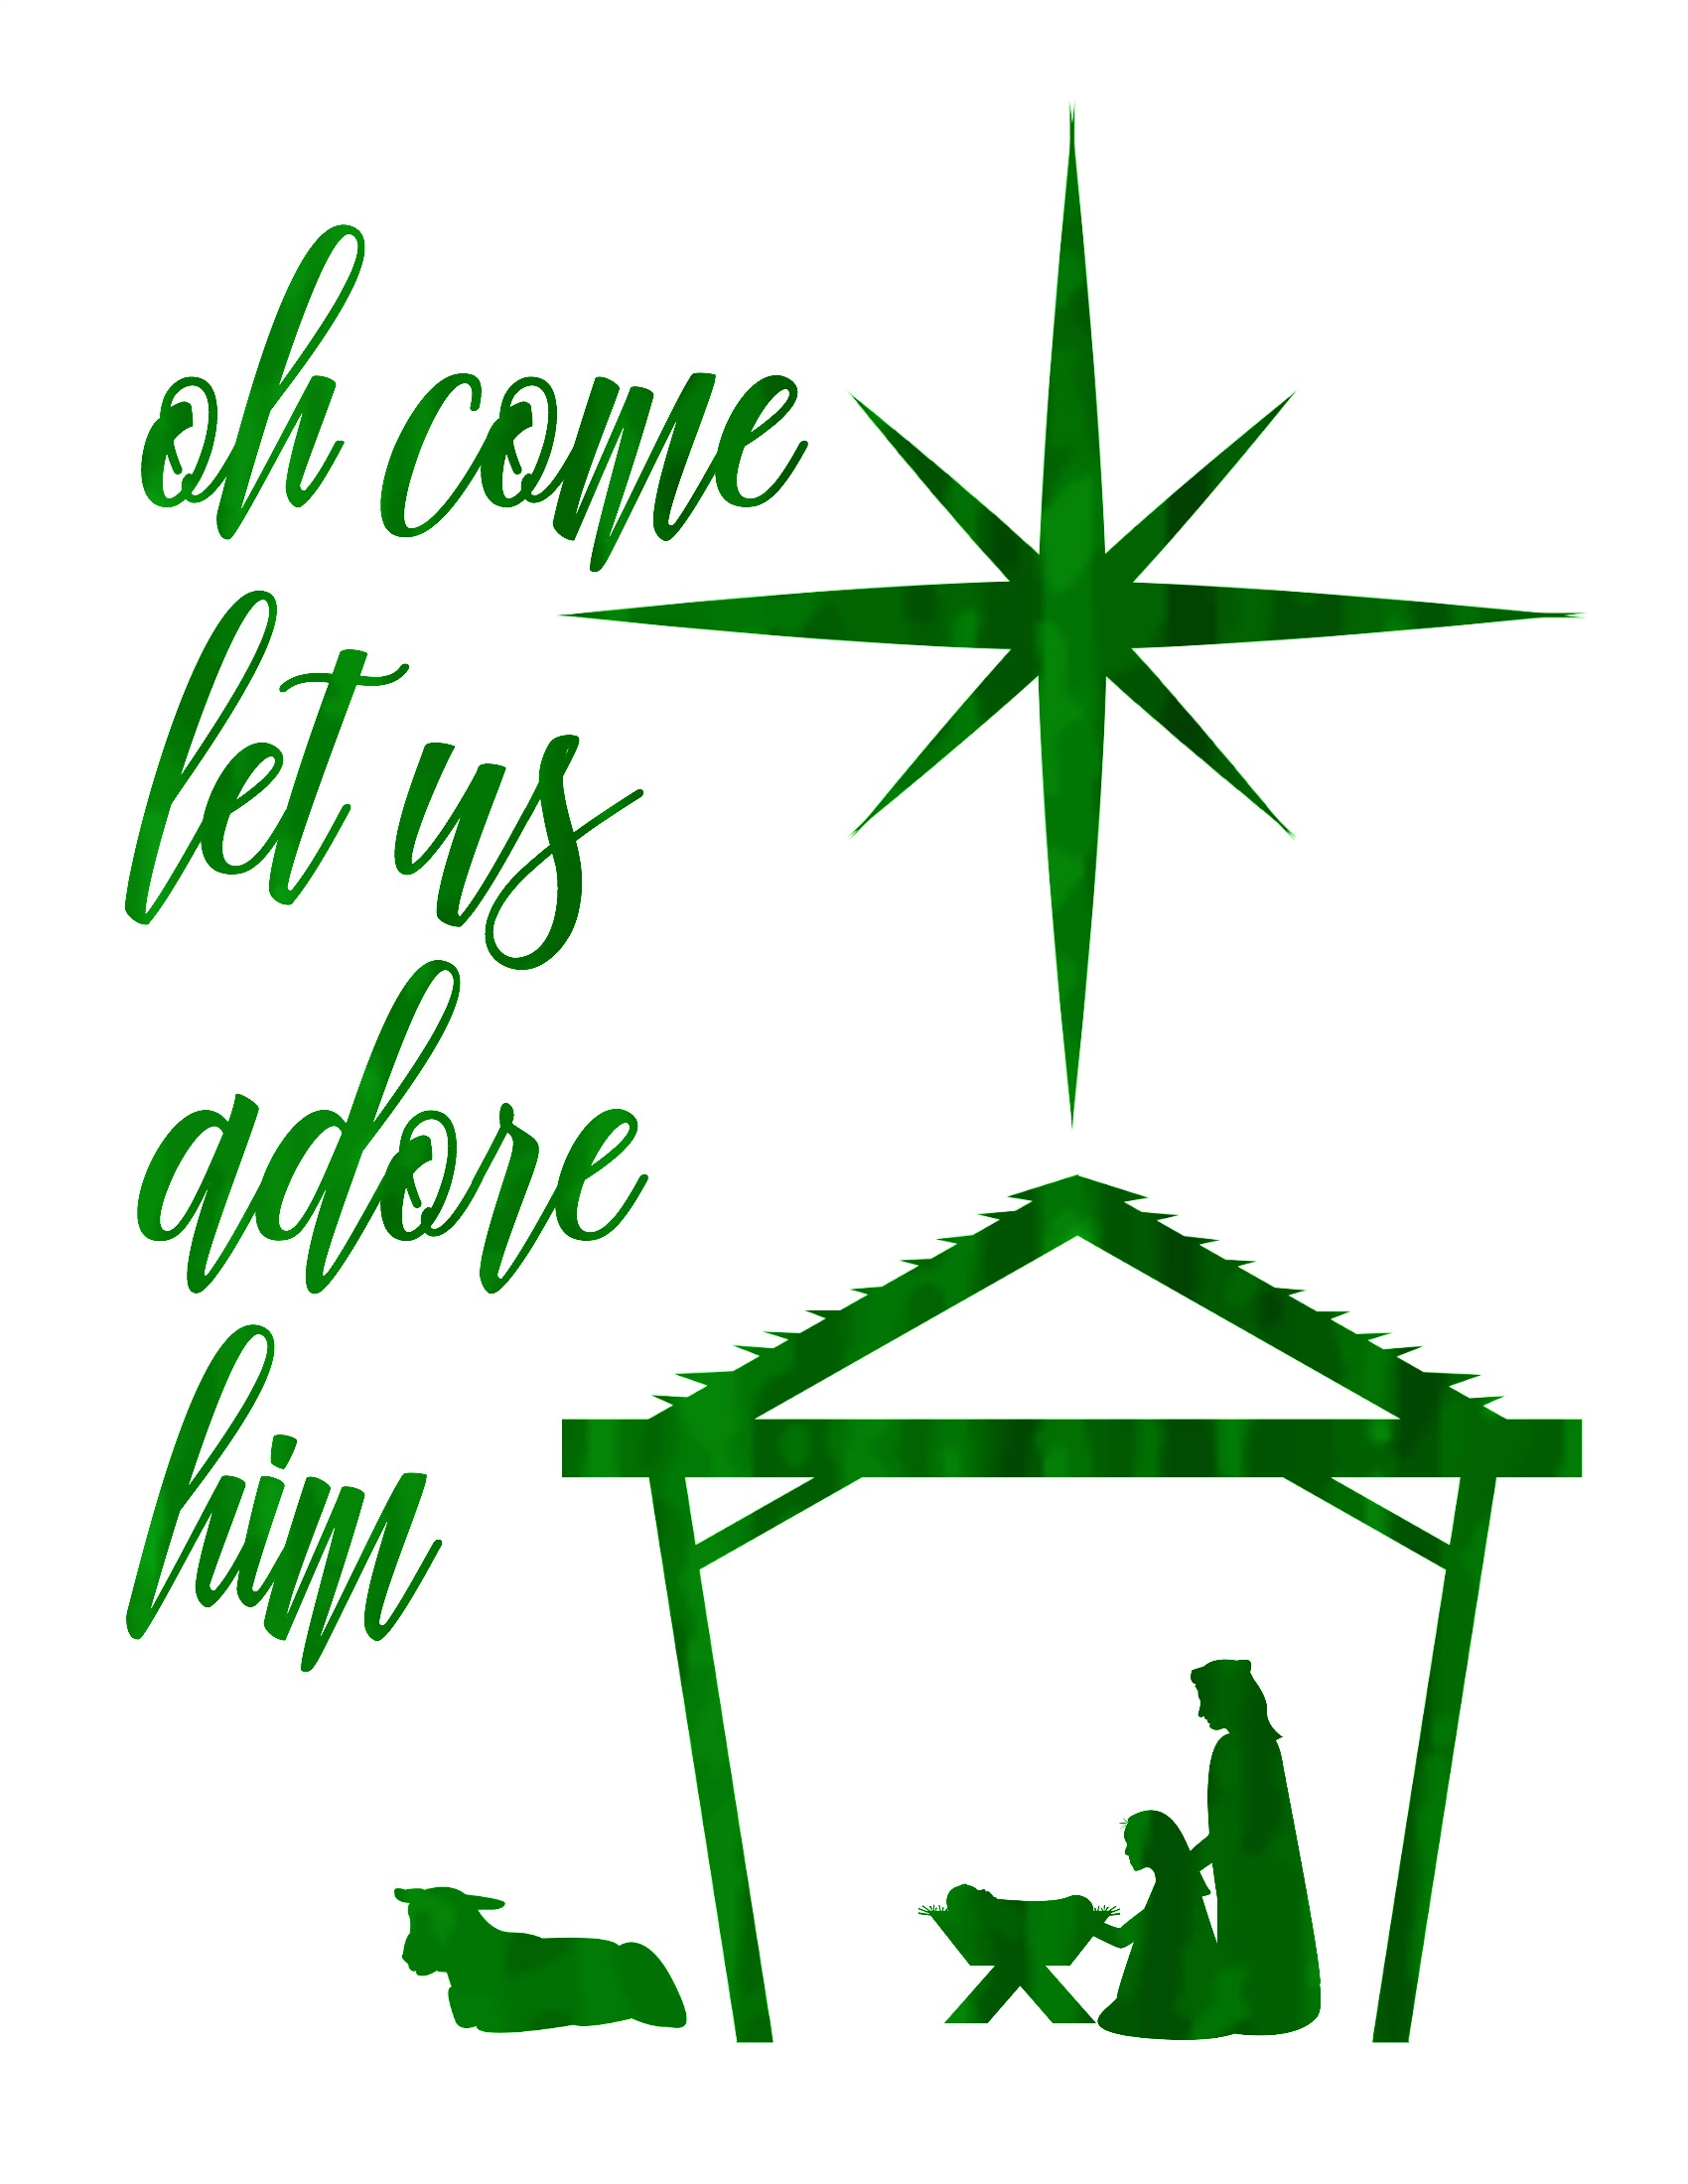 photograph regarding Nativity Clipart Free Printable identified as Oh Appear Permit Us Enjoy Him Totally free Xmas Nativity Printable